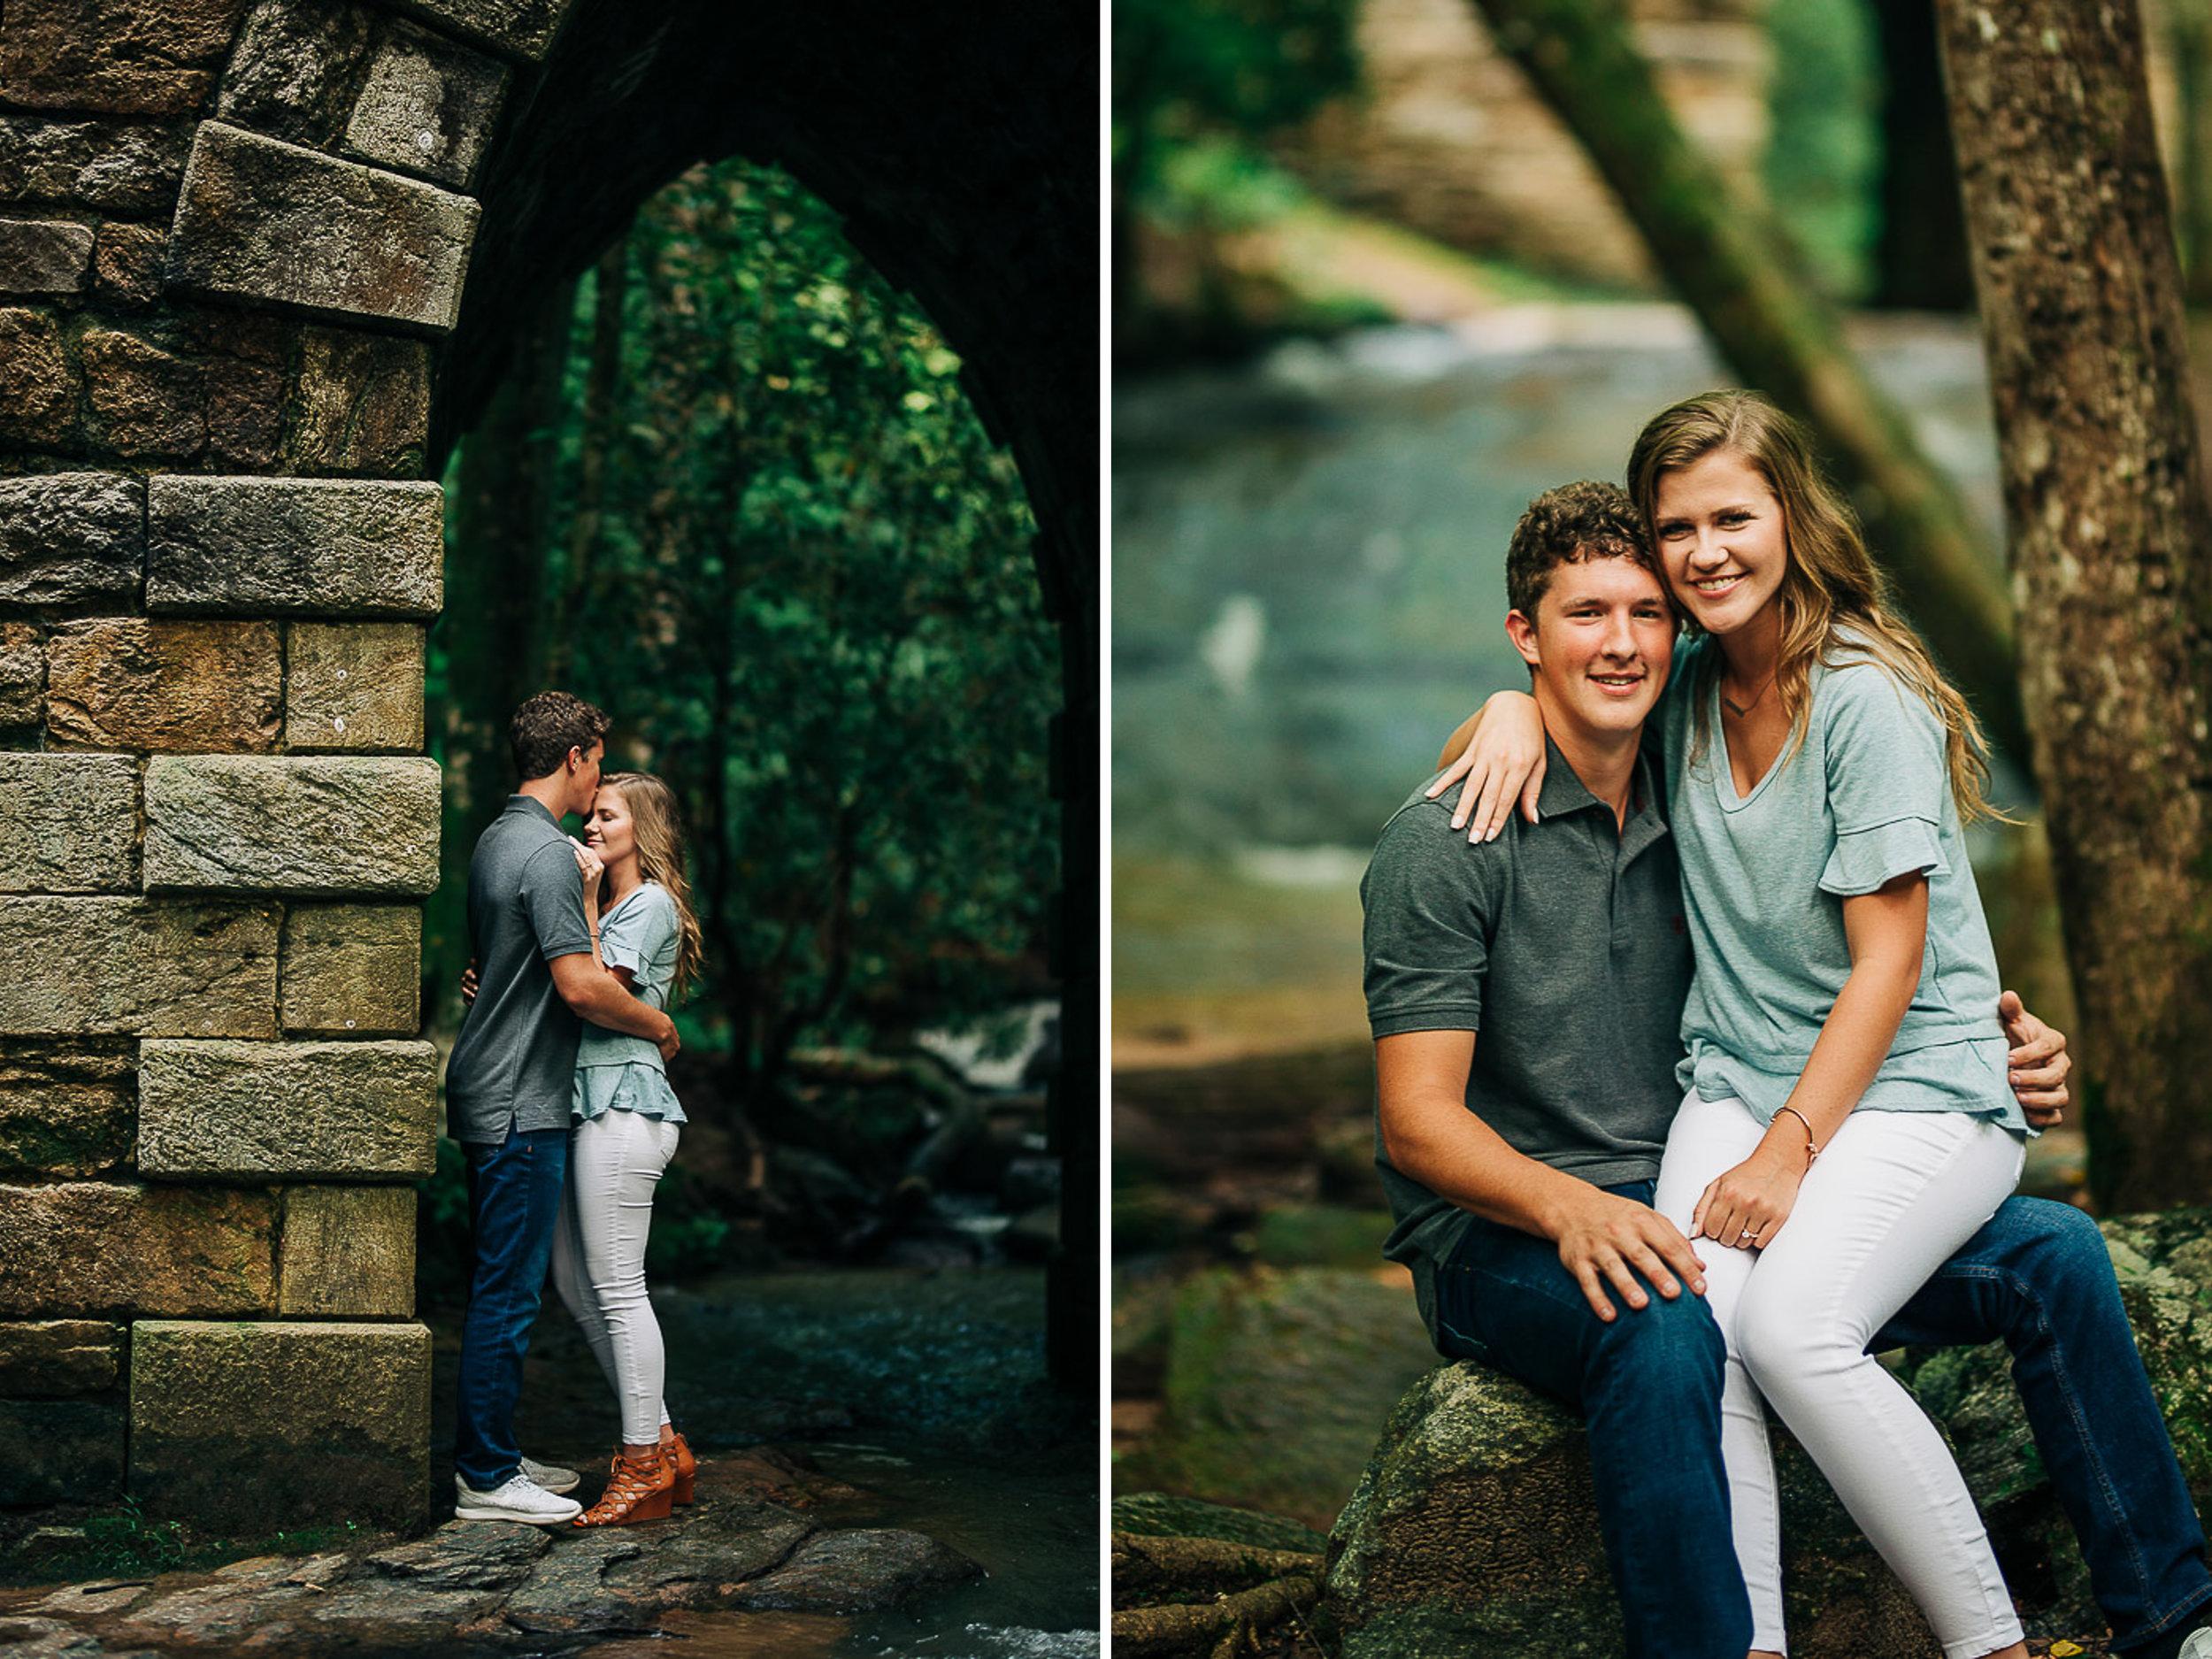 Engagement Portraits, Summer Engagement, Summer Mast Photography, 01.jpg